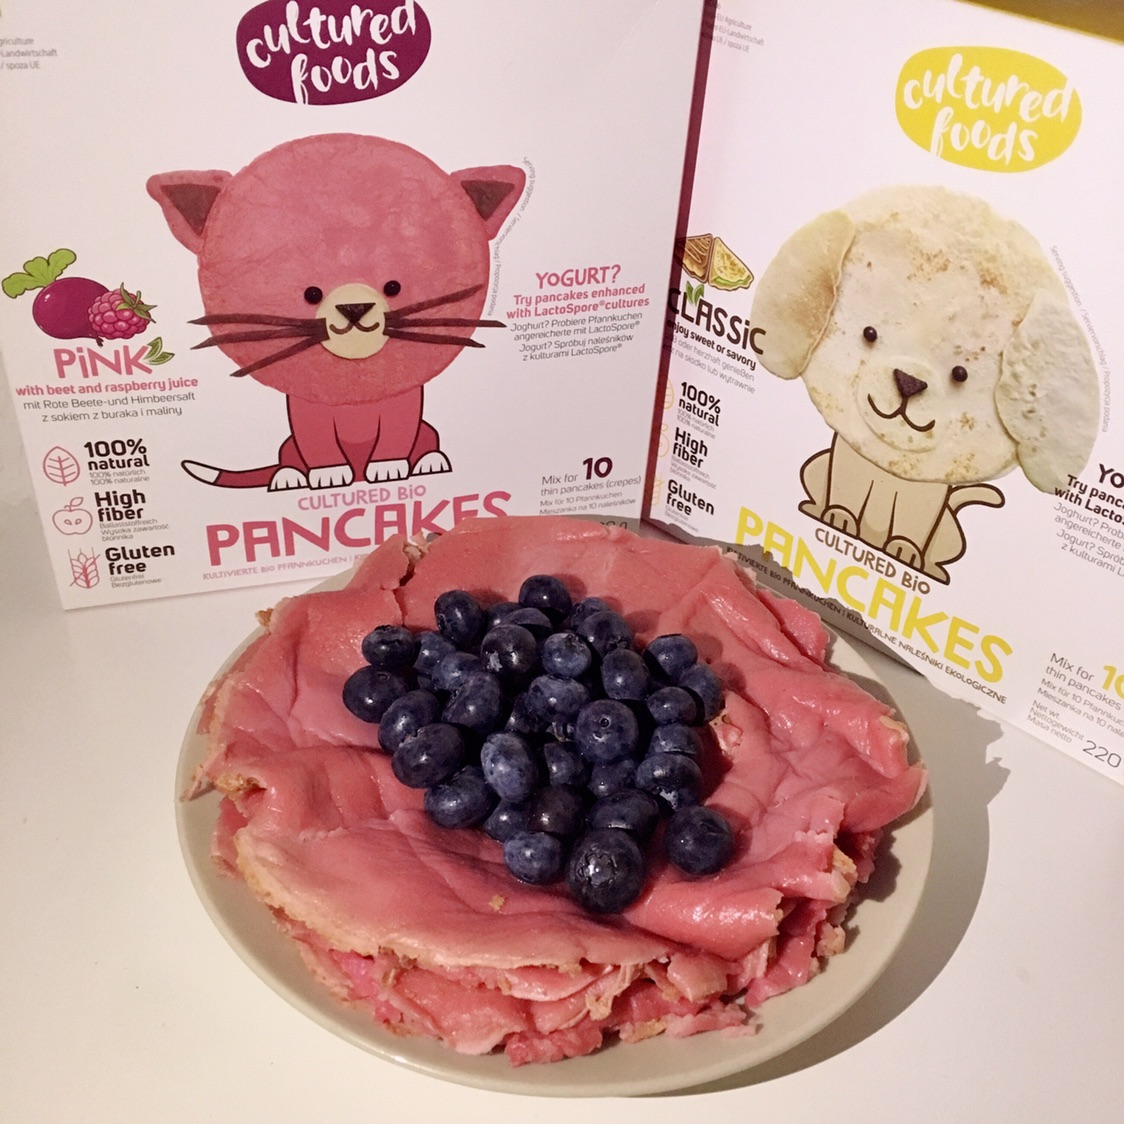 拔草:cultured food家的pancake粉